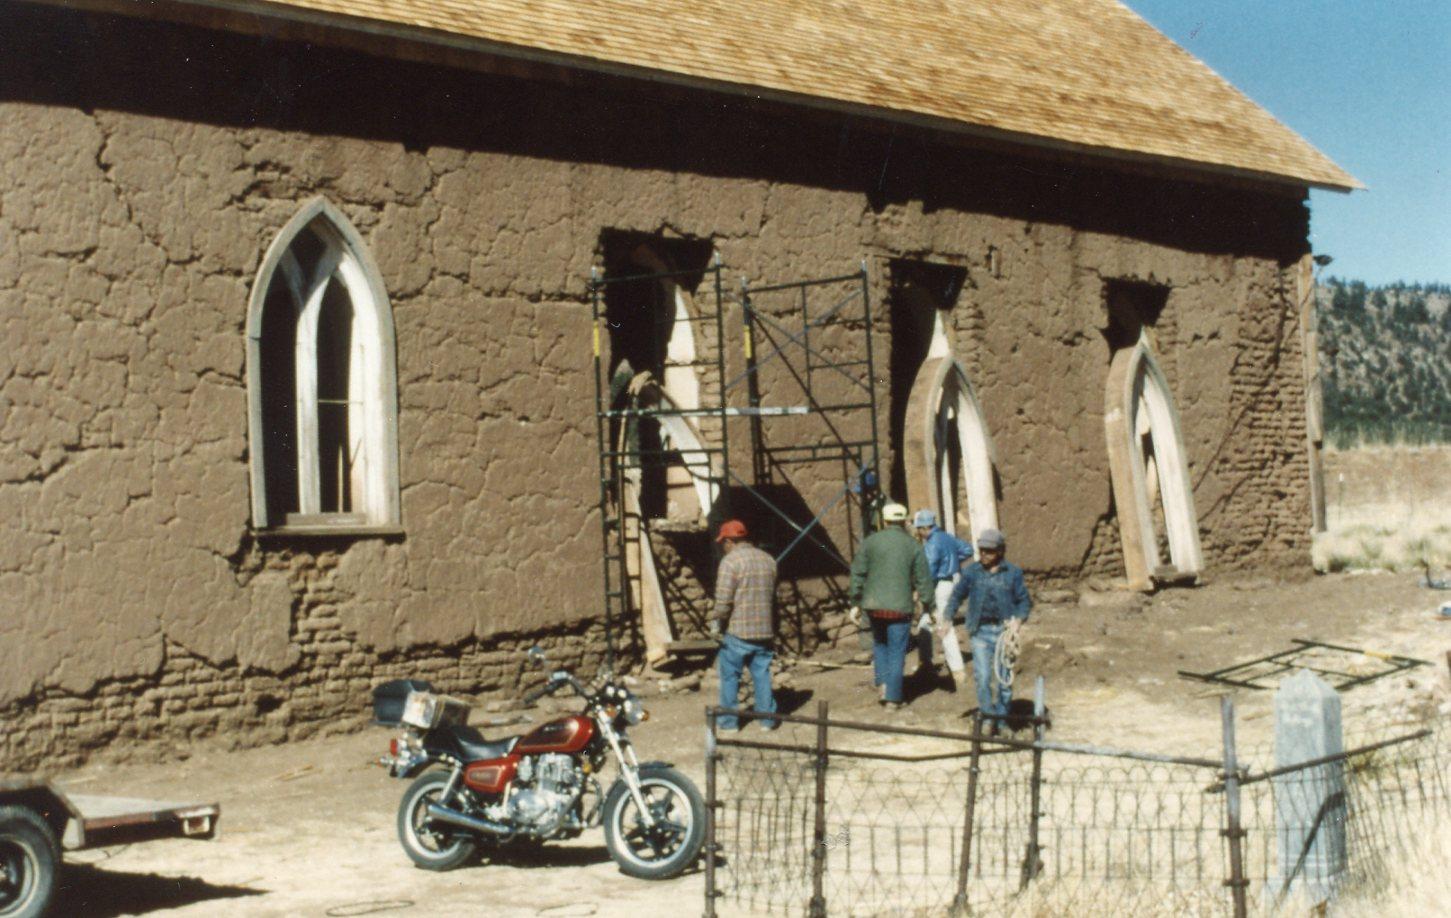 2-Feb-begin-window-removal-for-restoration-Photos-Ed-Crocker622.jpg